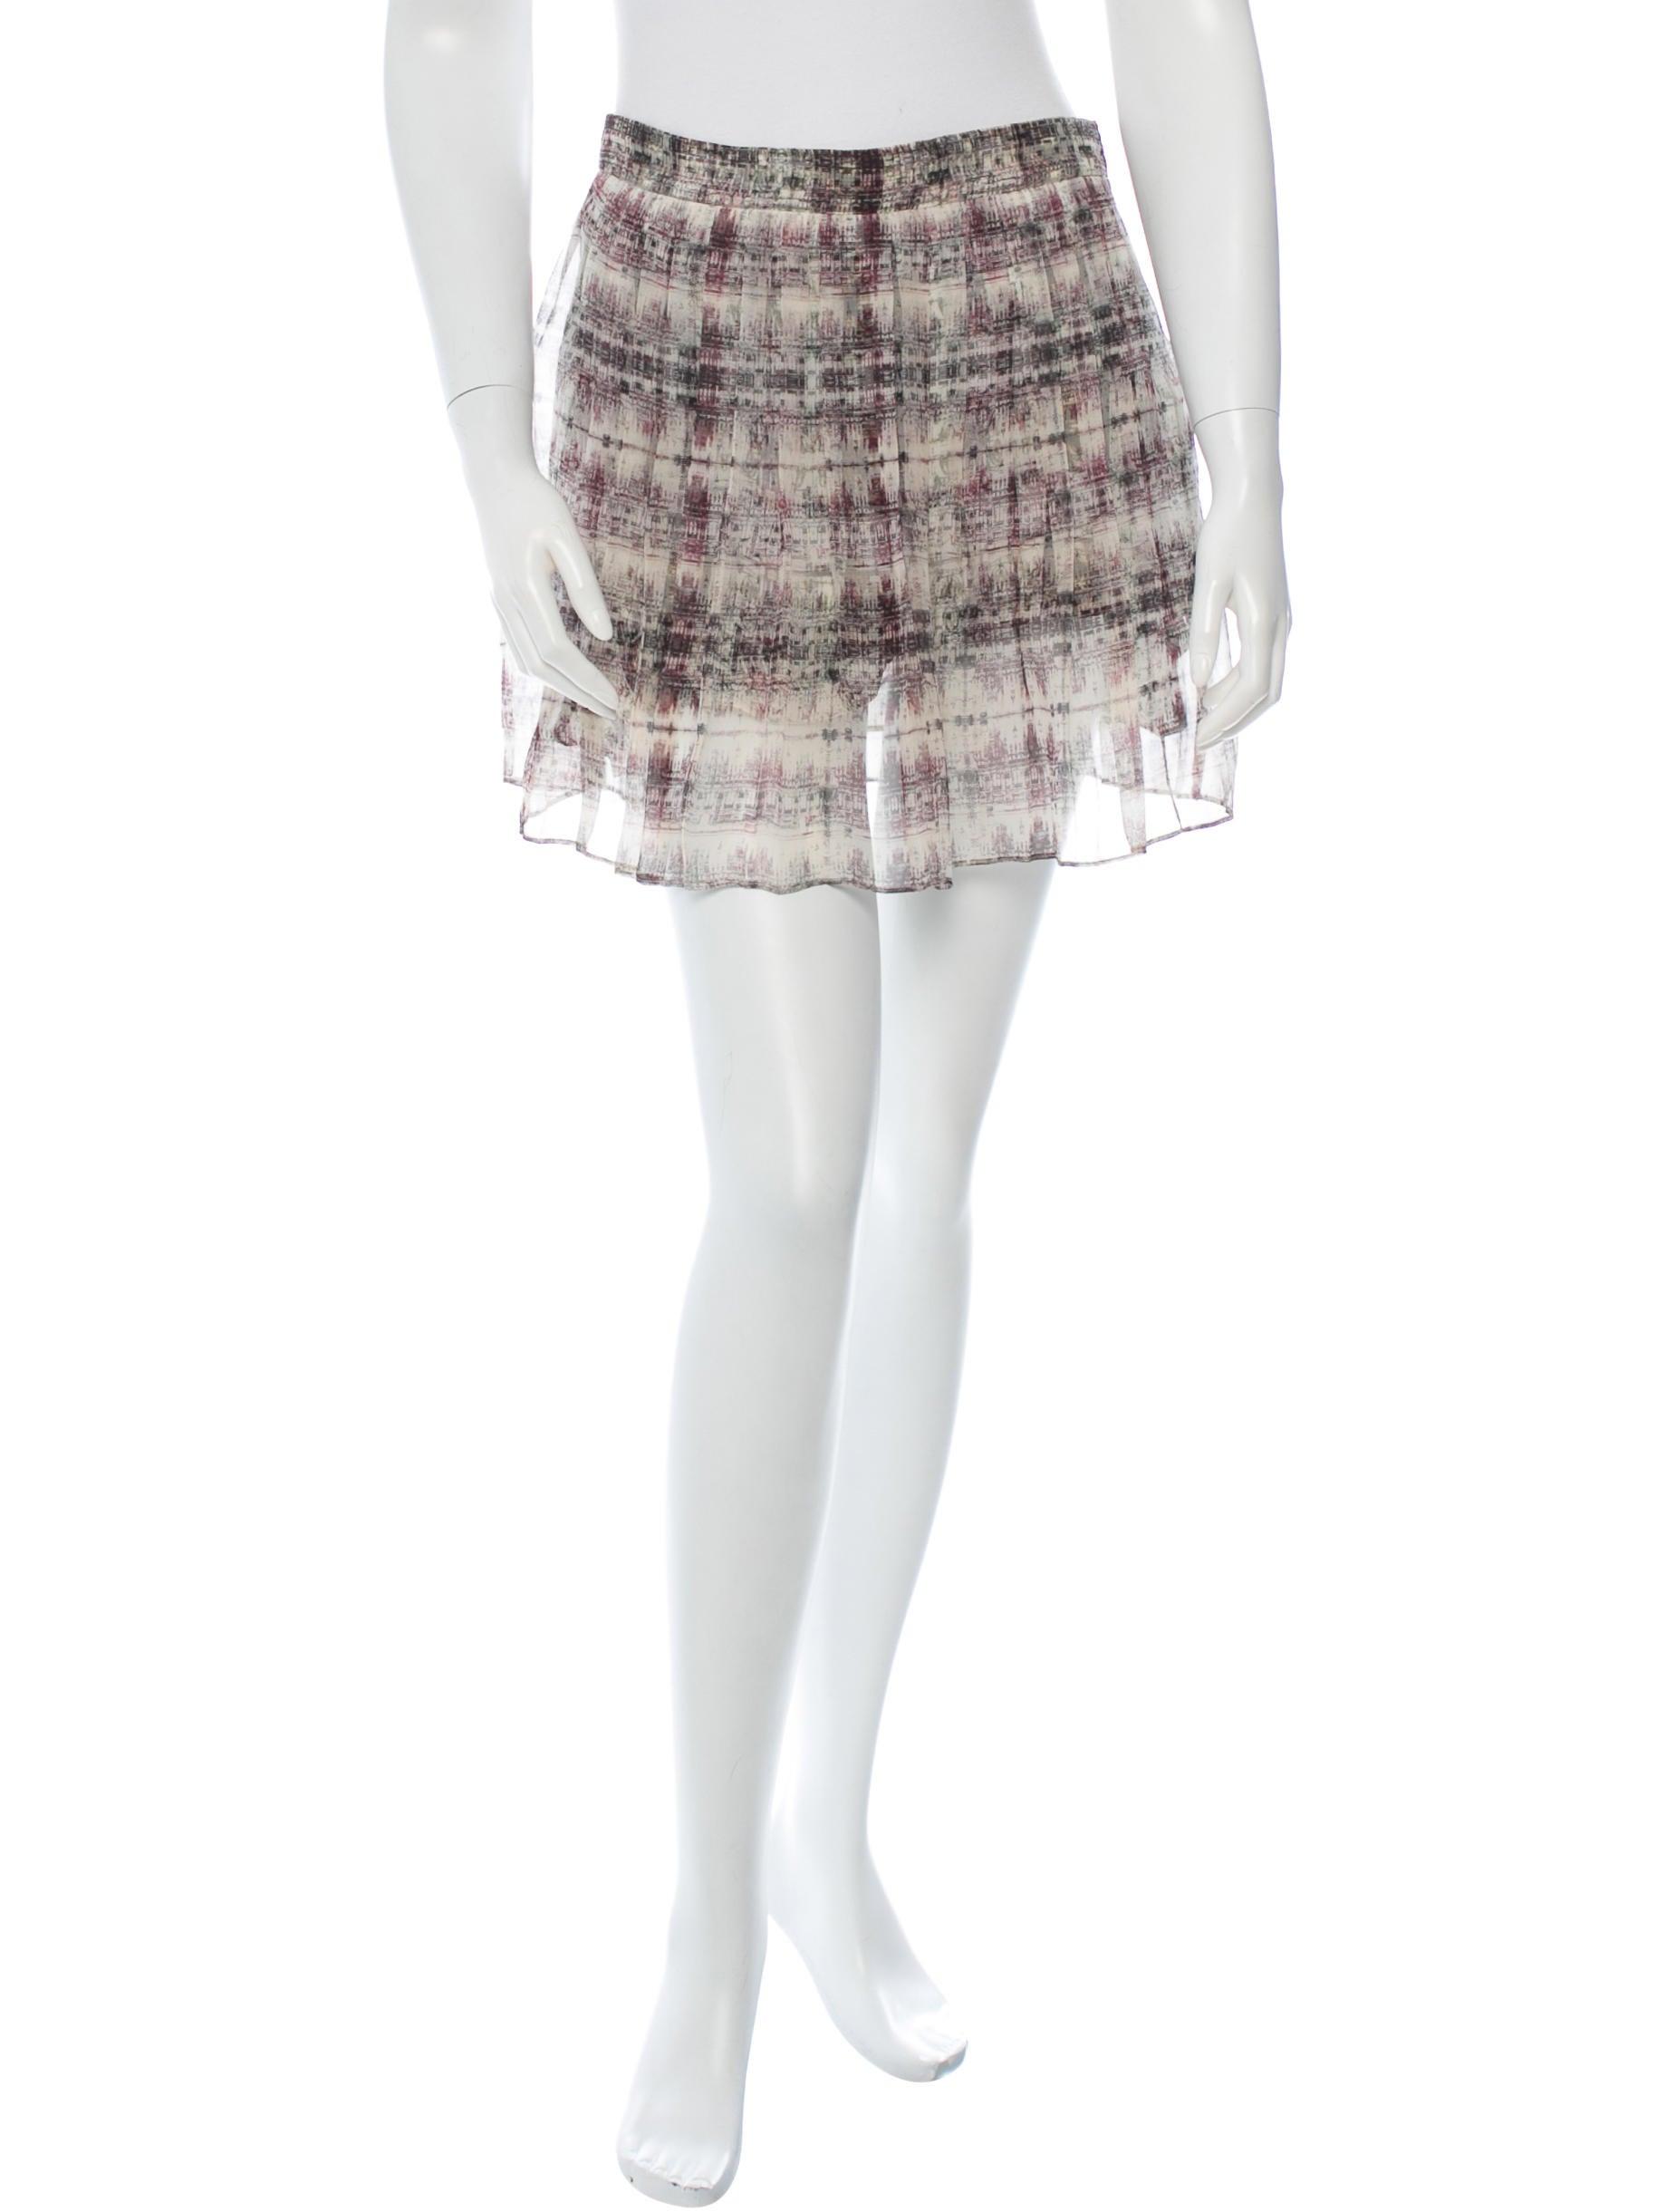 theyskens theory pleated skirt skirts wthys22066